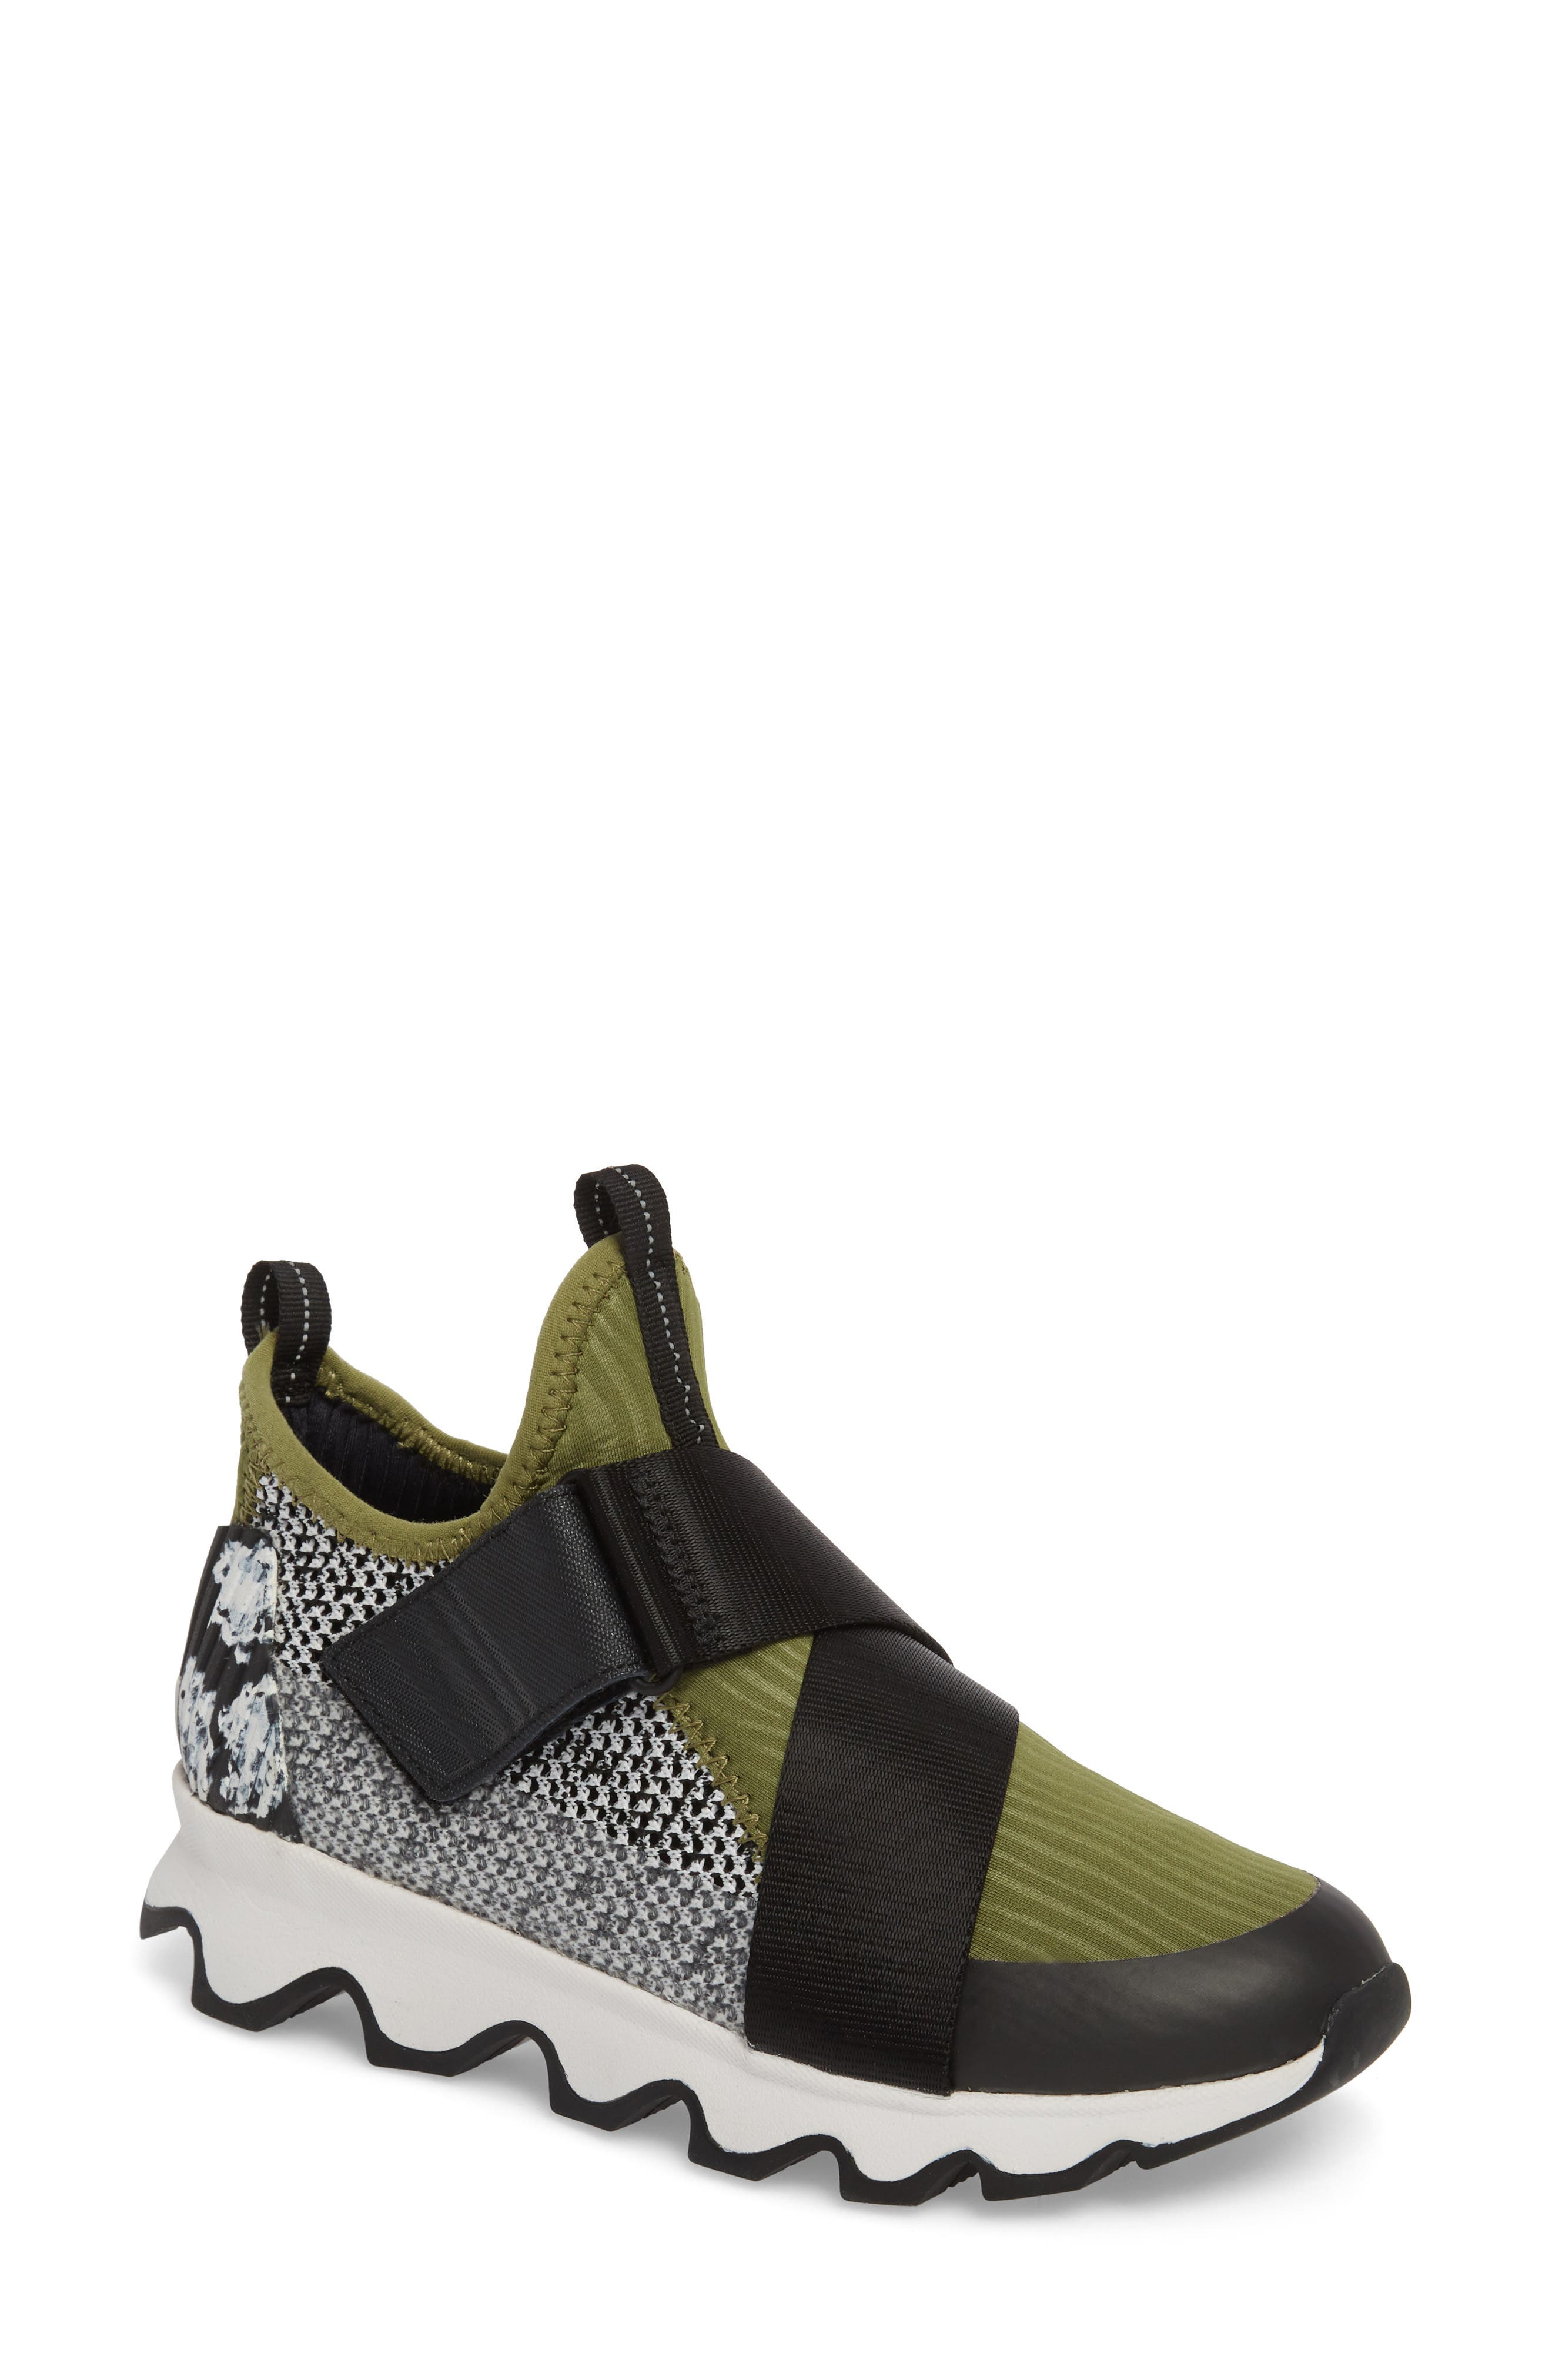 Kinetic Sneak High Top Sneaker,                             Main thumbnail 1, color,                             Olive Drab/ White